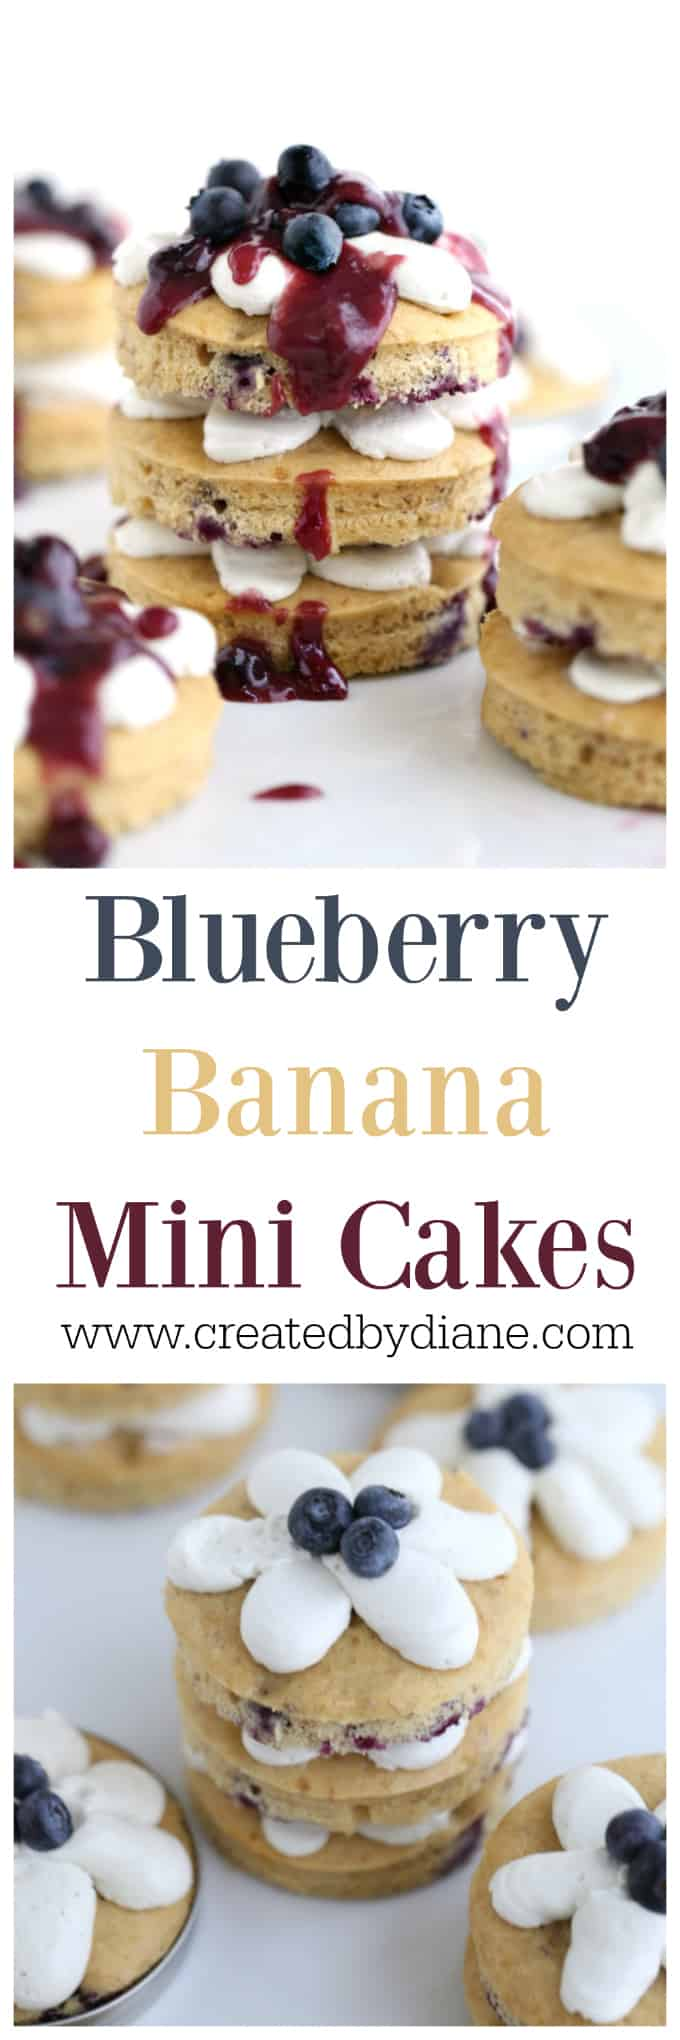 blueberry banana cake www.createdbydiane.com